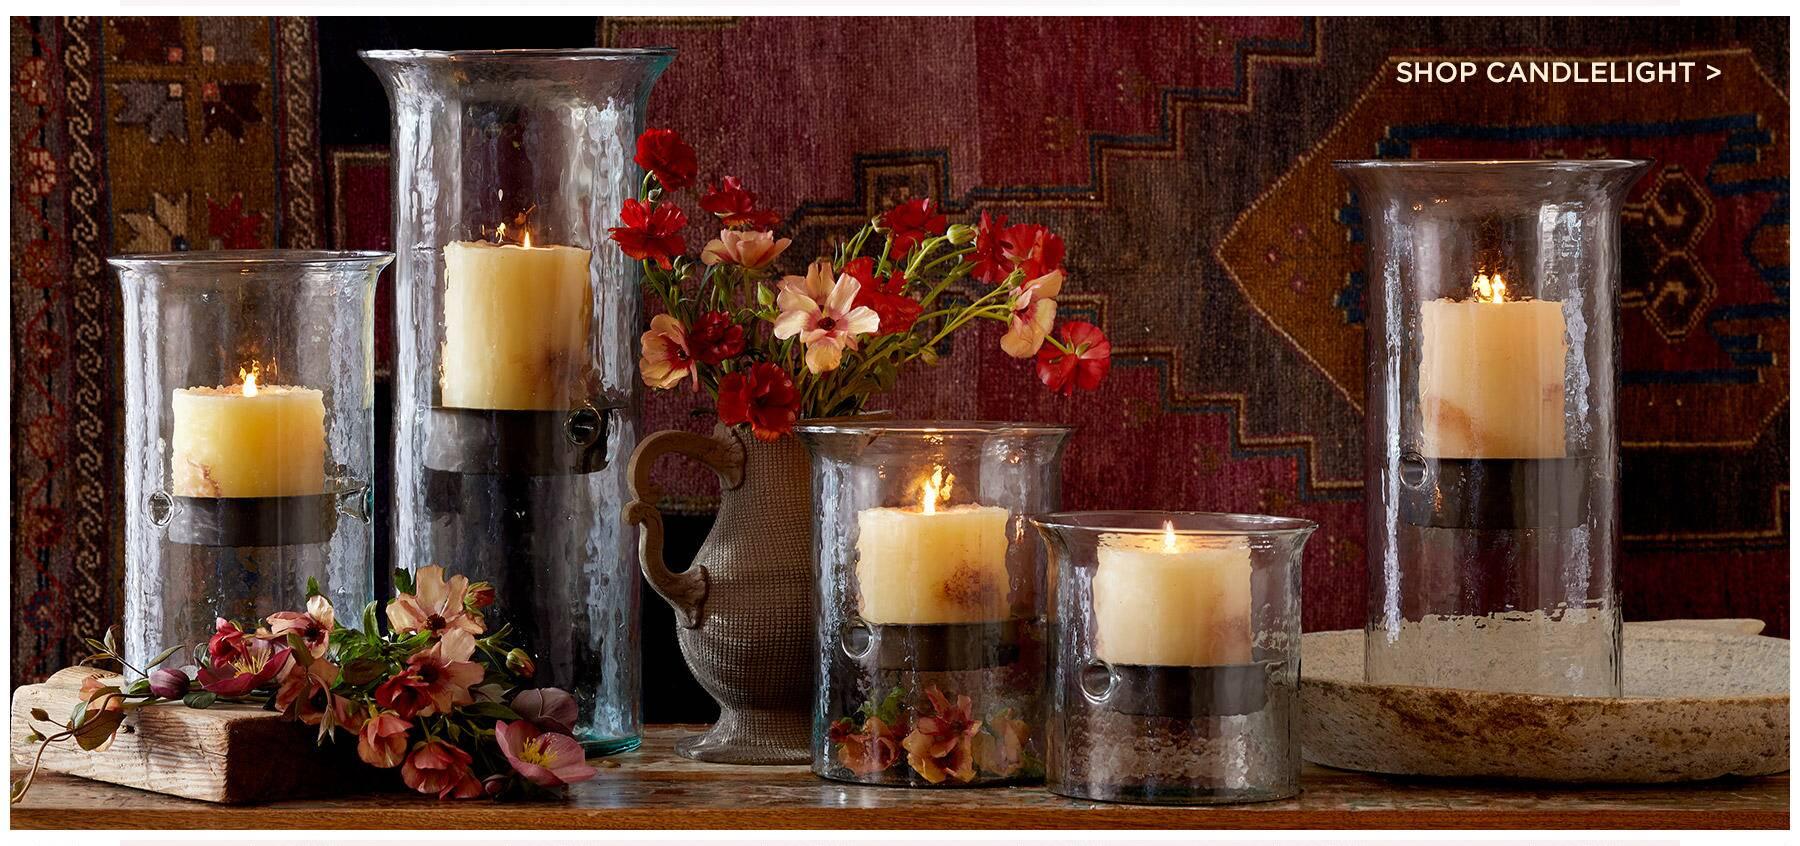 Shop Candlelight